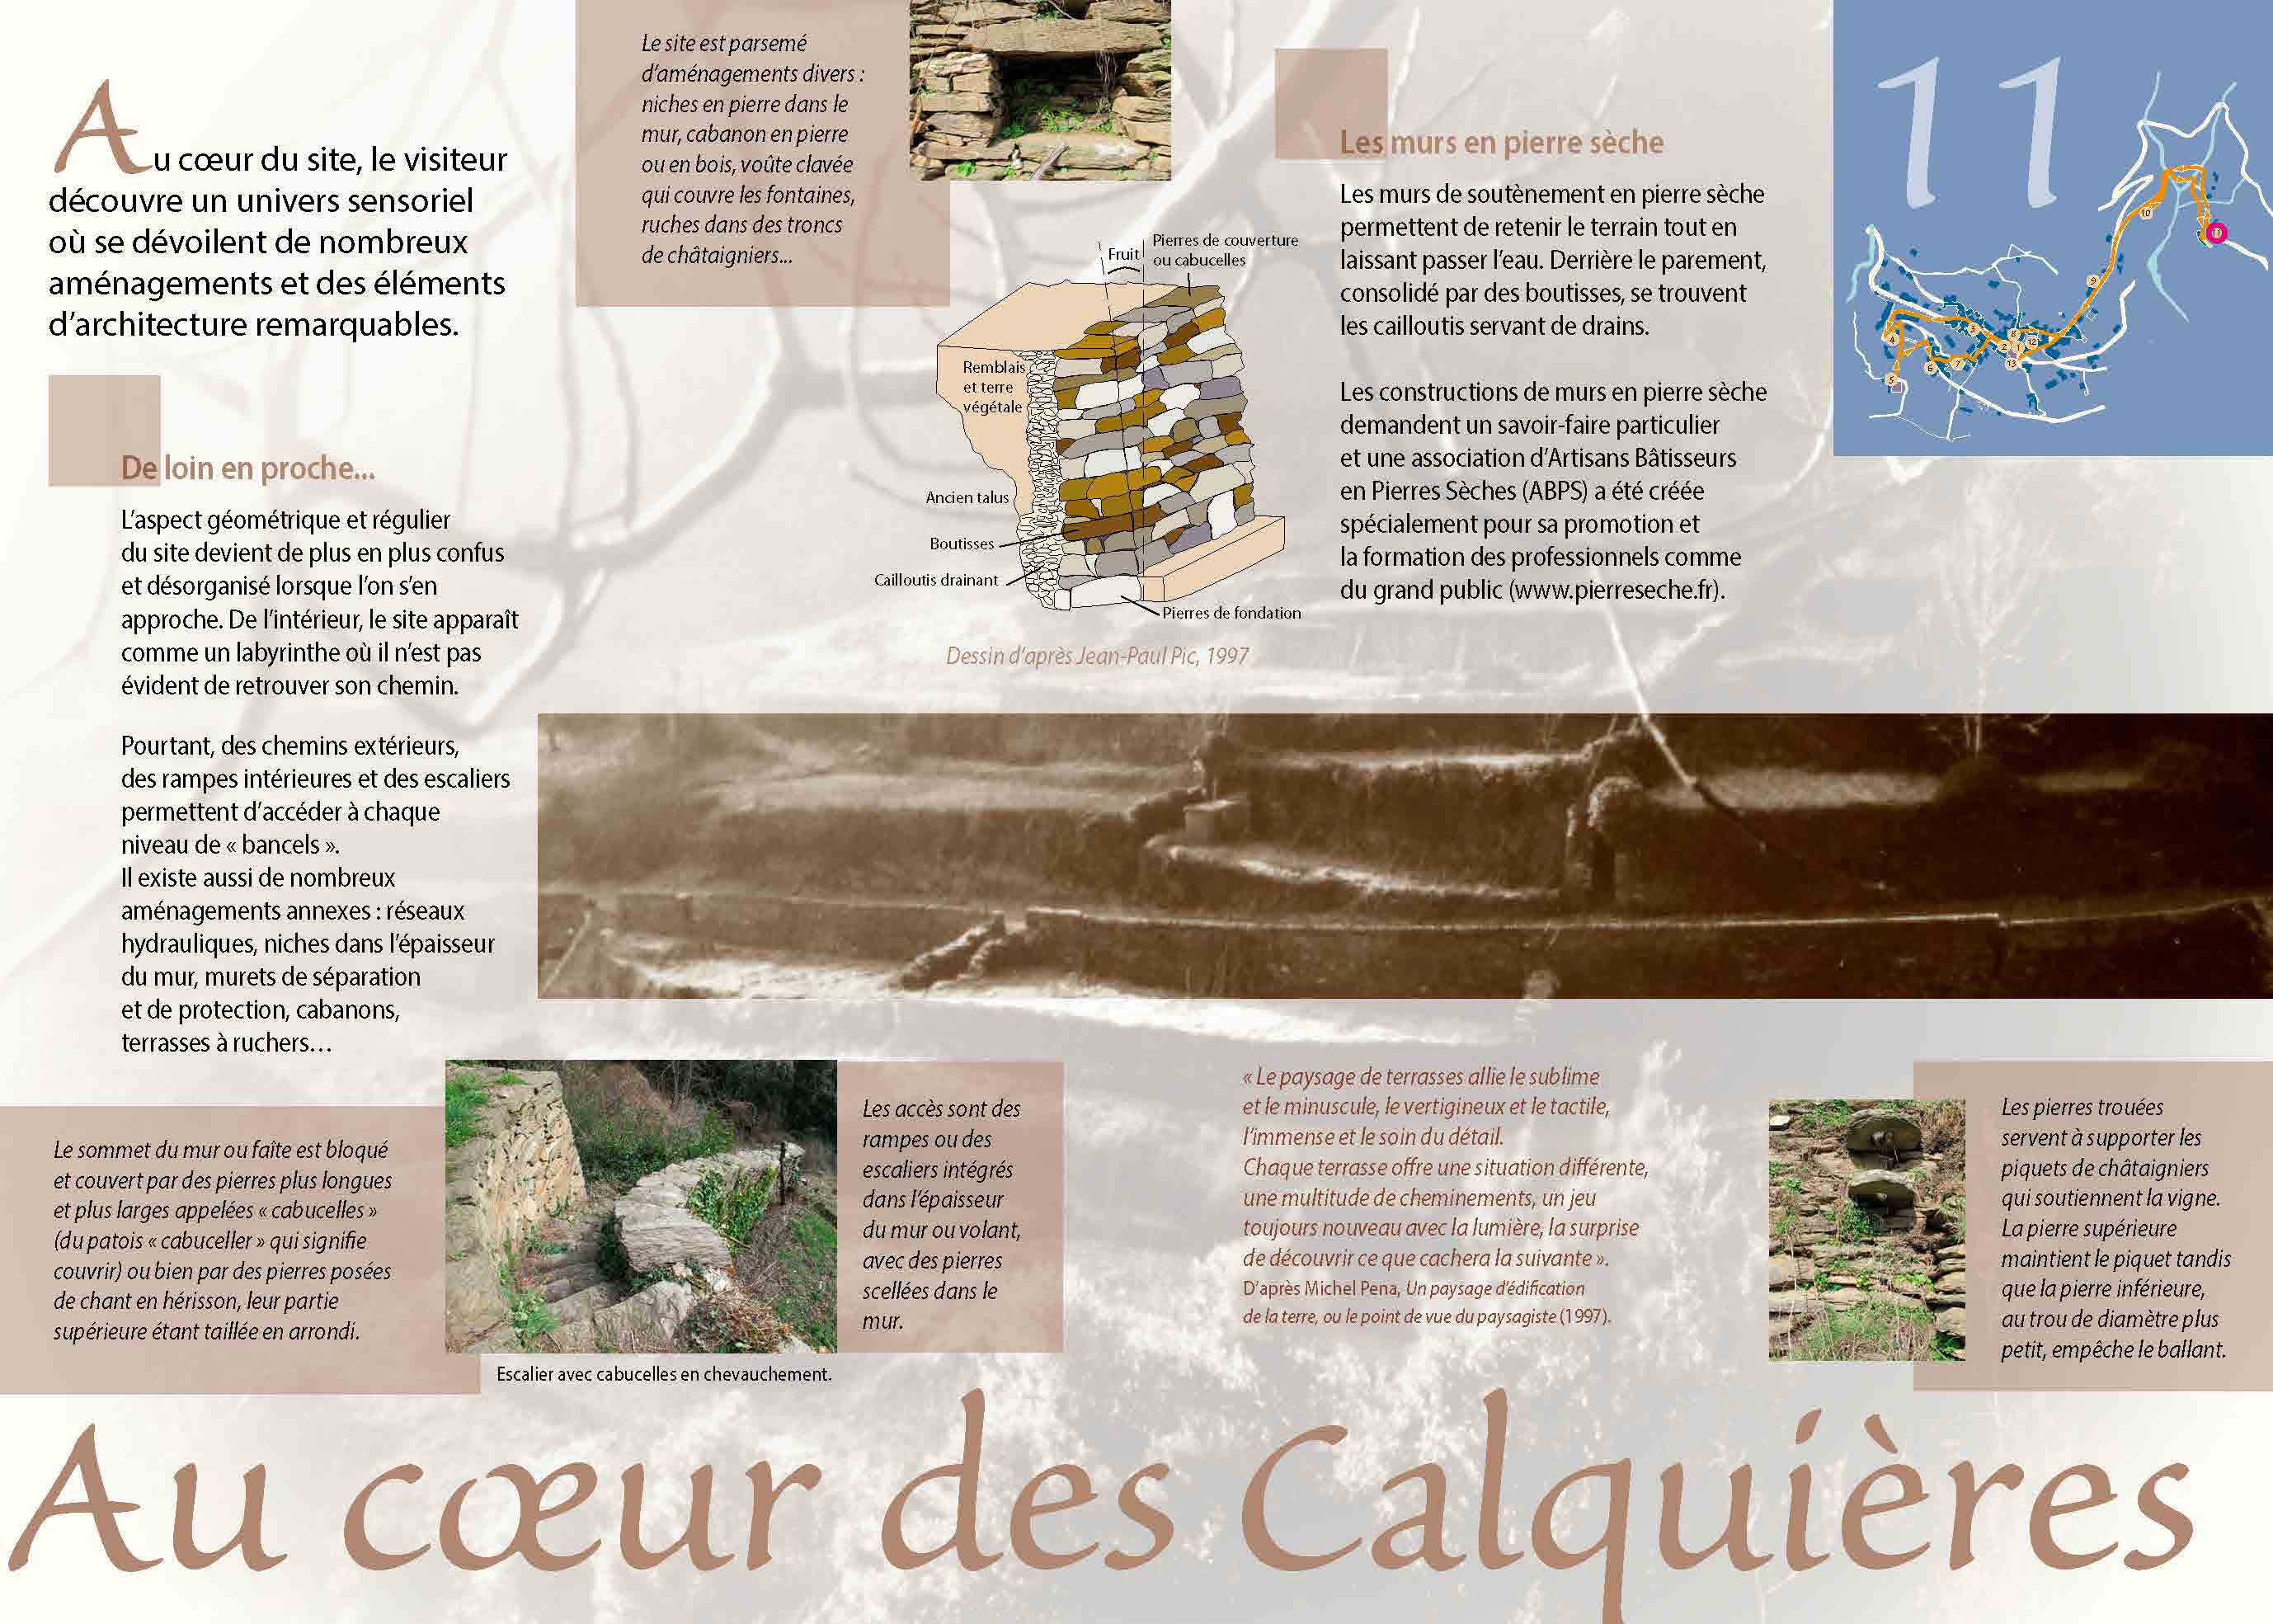 Les Calquières: les jardins en terrasses de Saint-Germain-de-Calberte